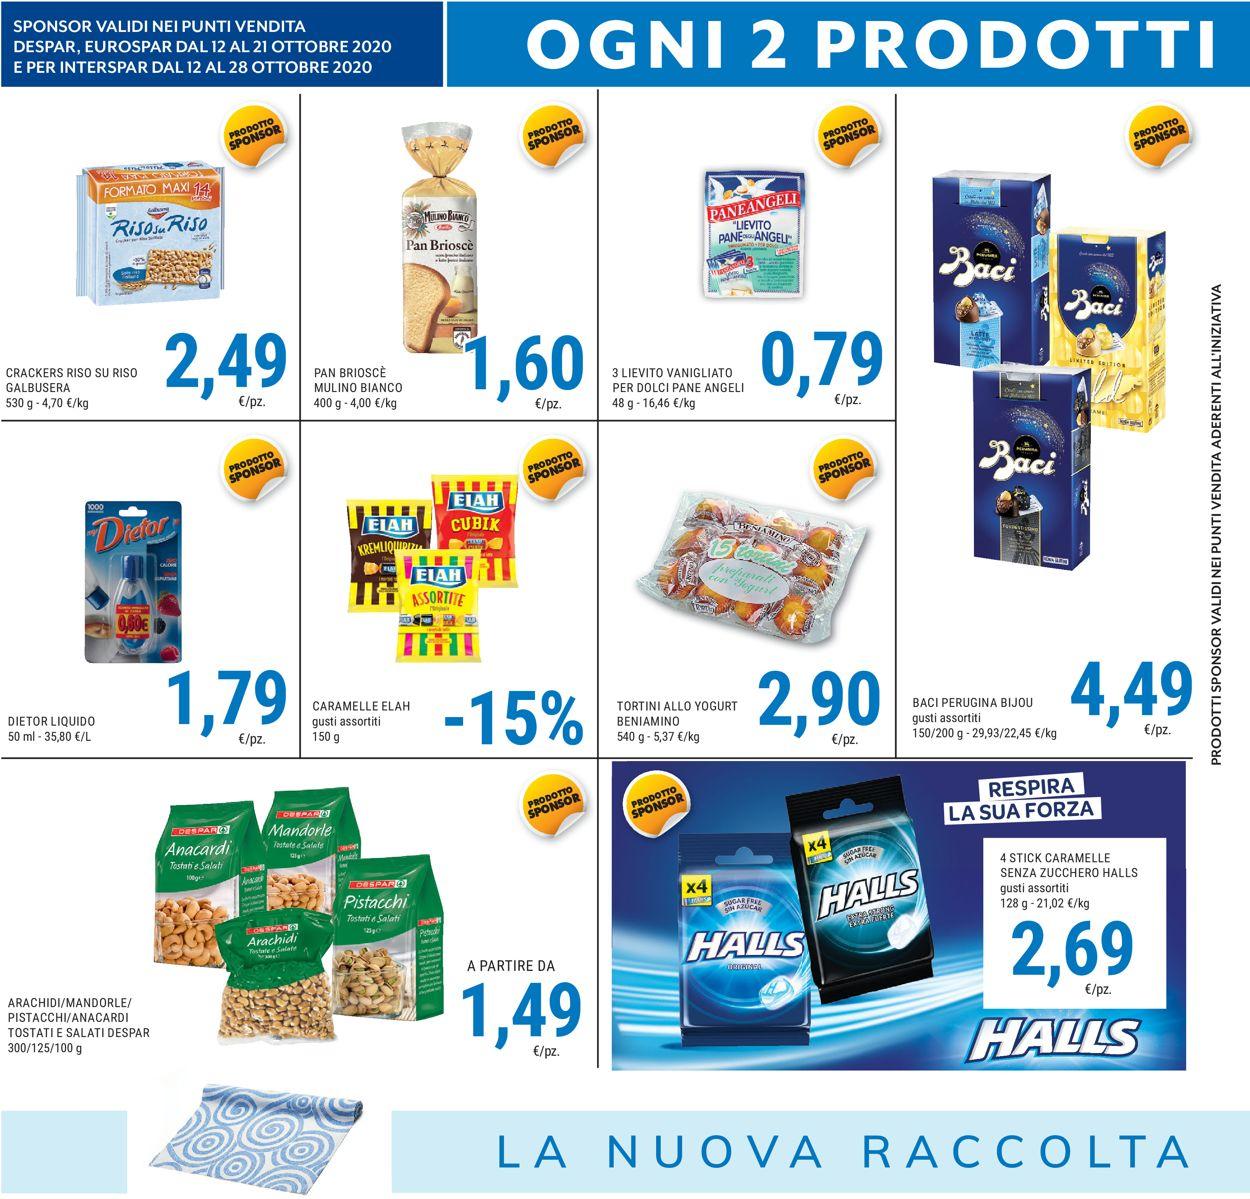 Volantino Interspar - Offerte 12/10-28/10/2020 (Pagina 8)